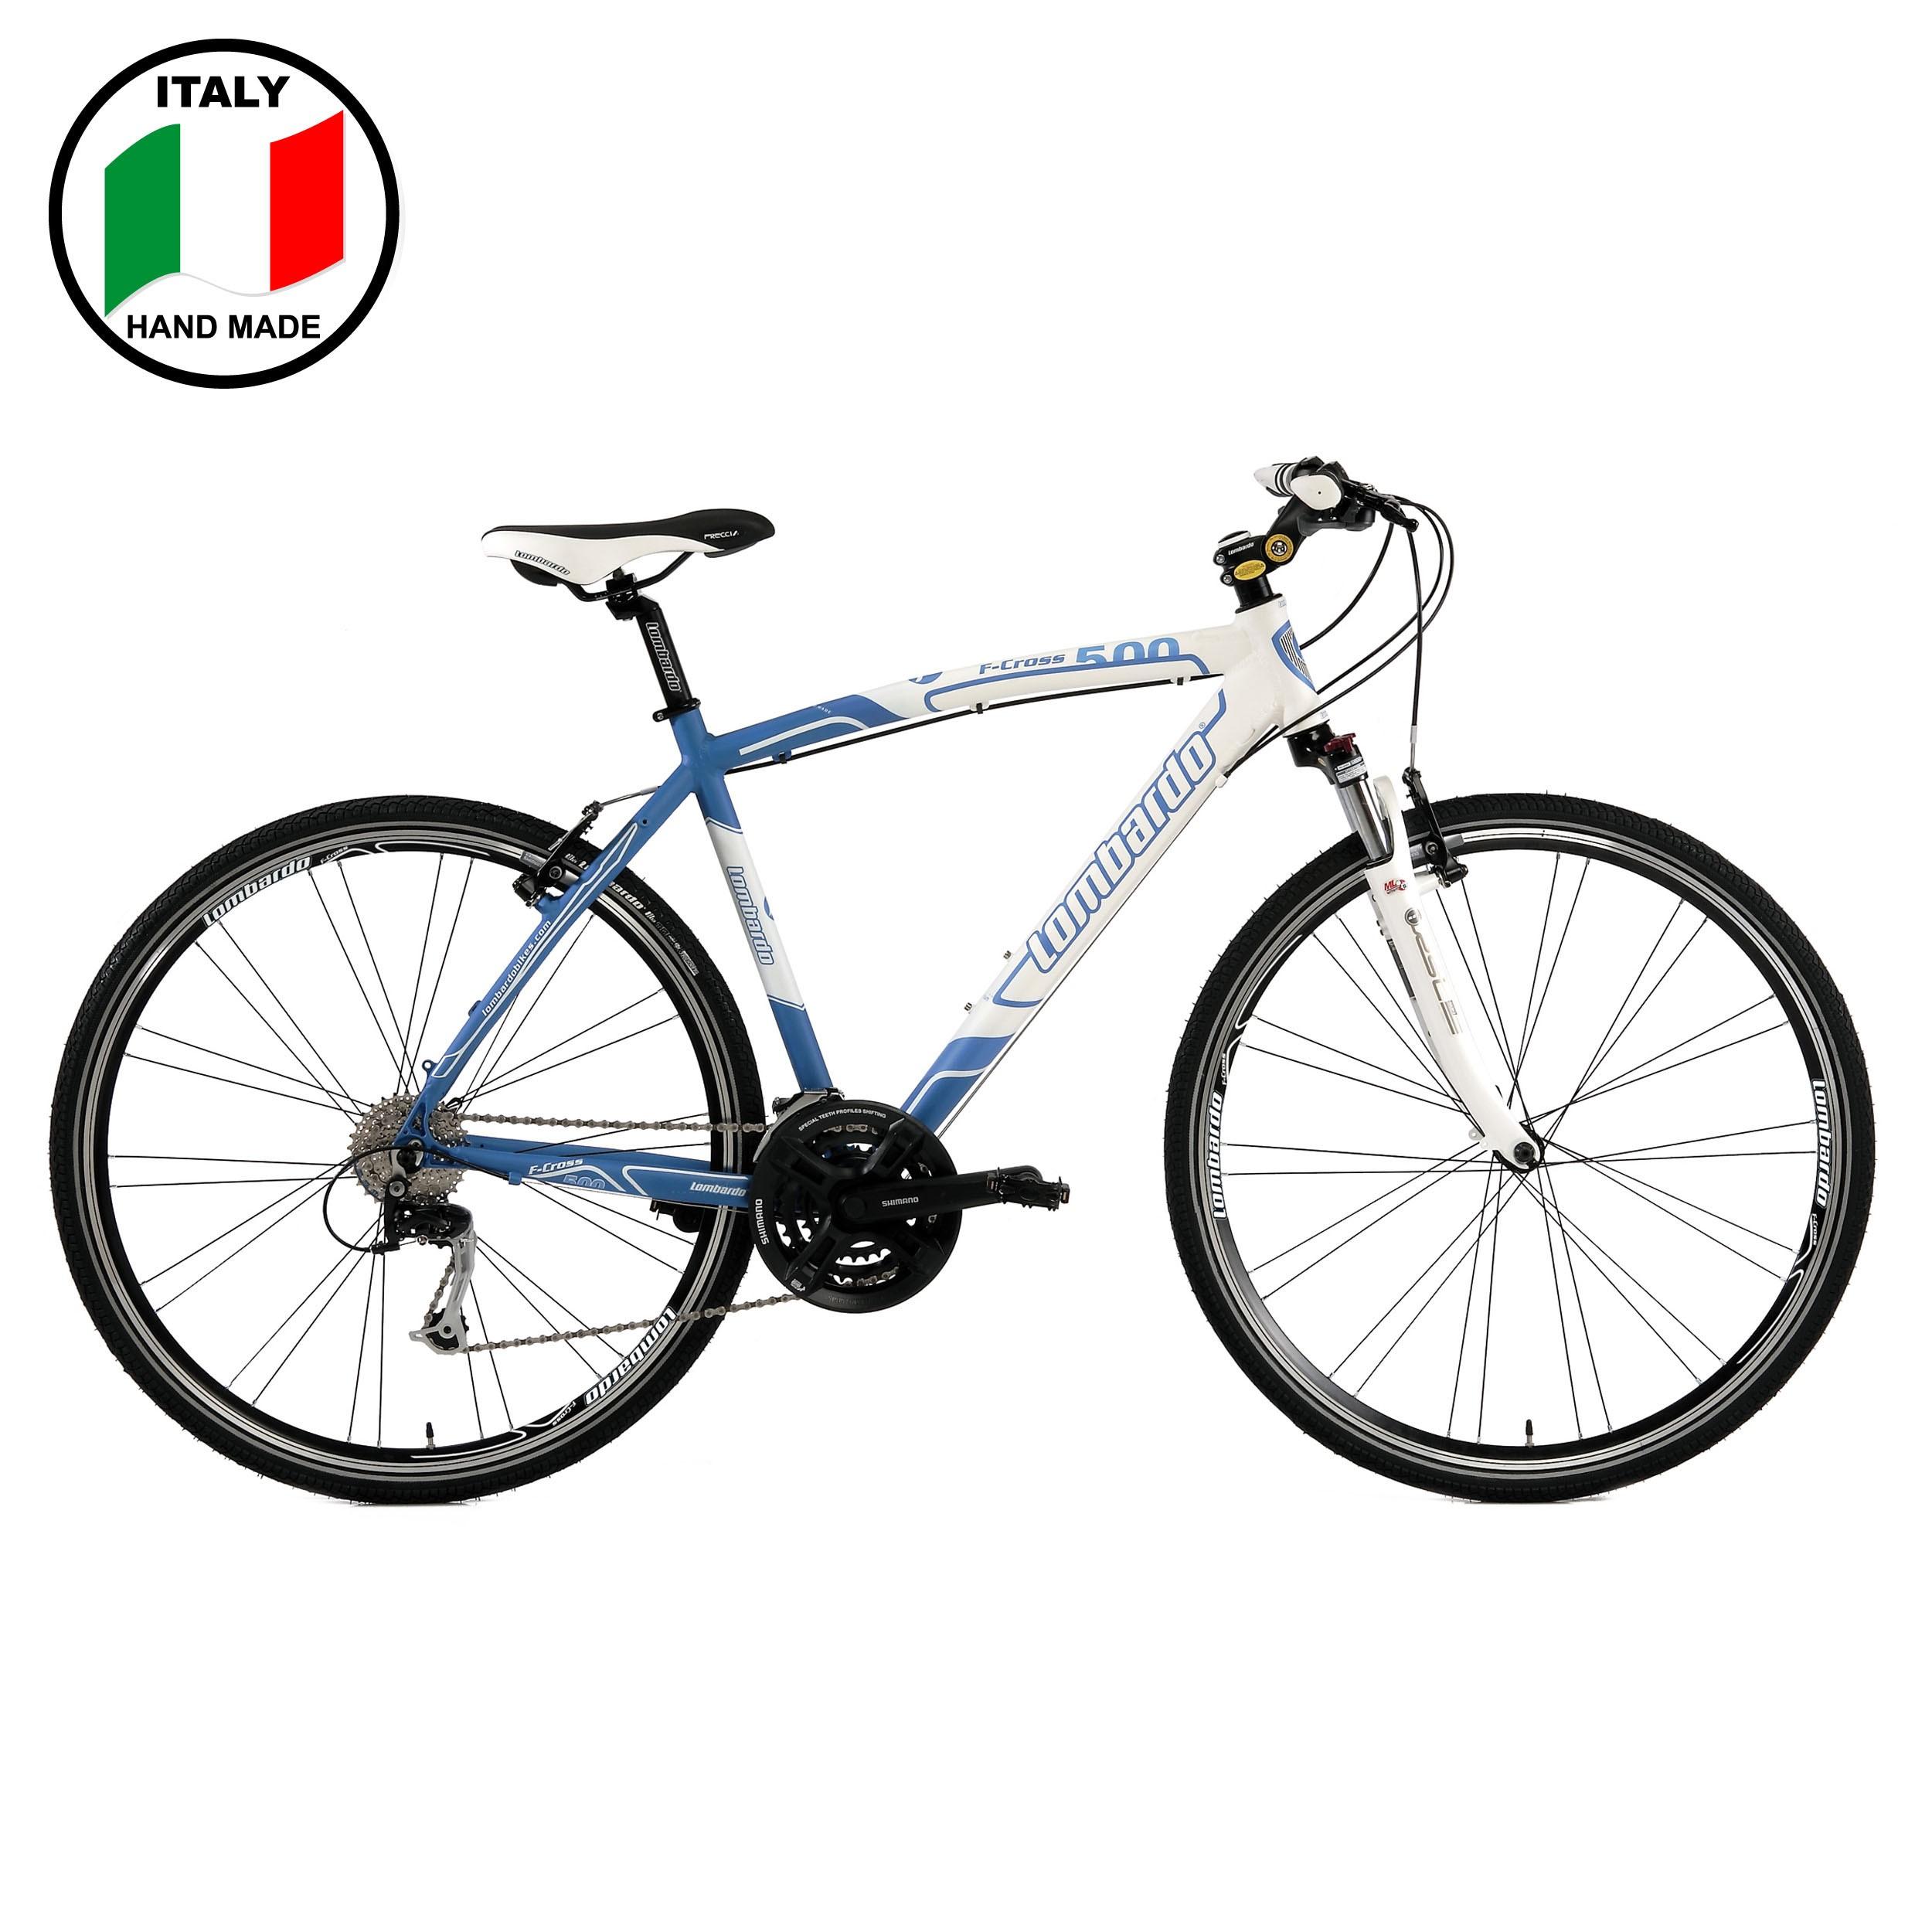 Lombardo f cross 500 mens 28 inch bike blue and white